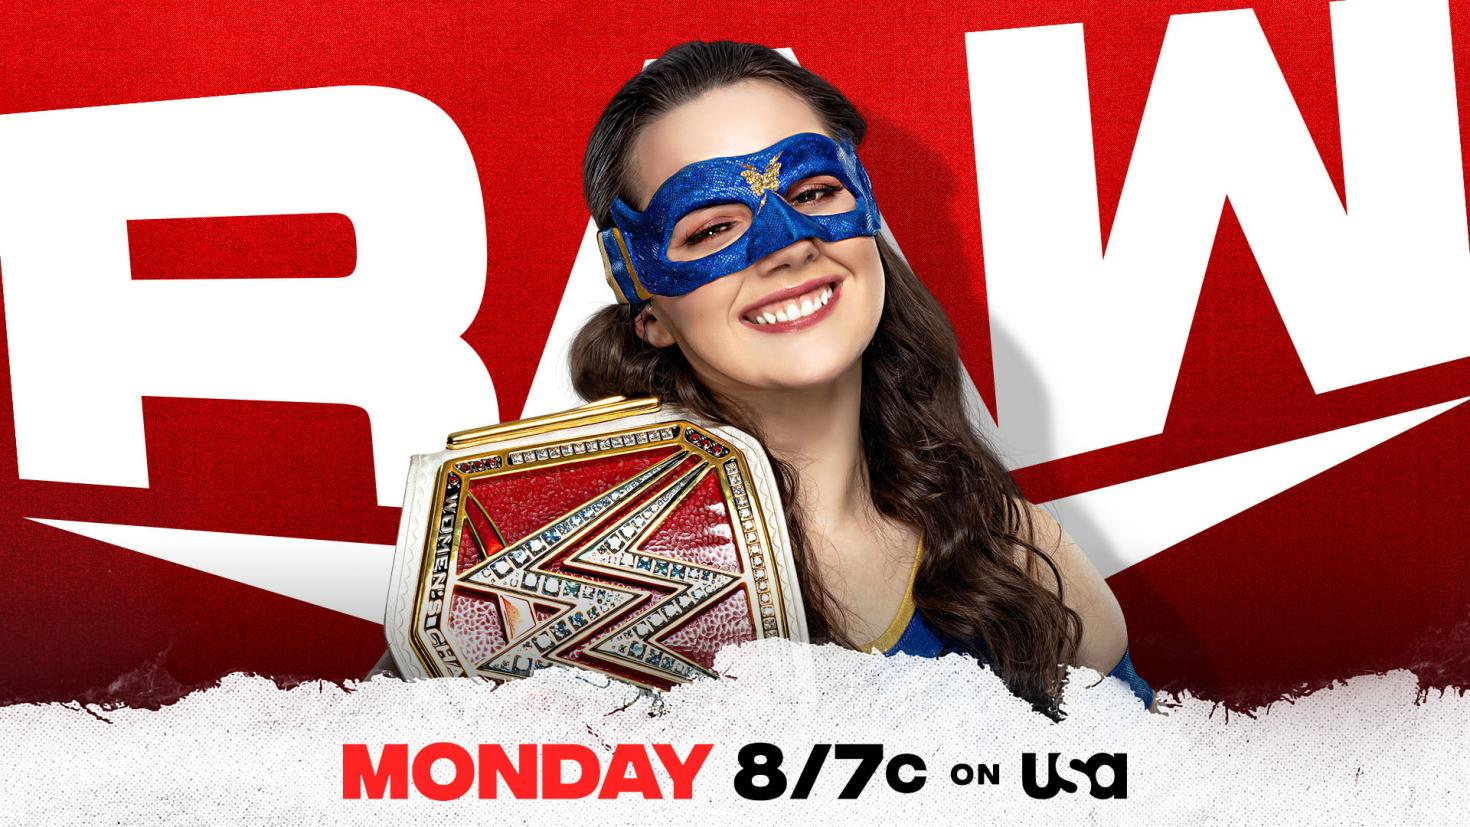 WWE Raw Preview (26/07/21): Bobby Lashley Responds; Championship Win Celebration 23